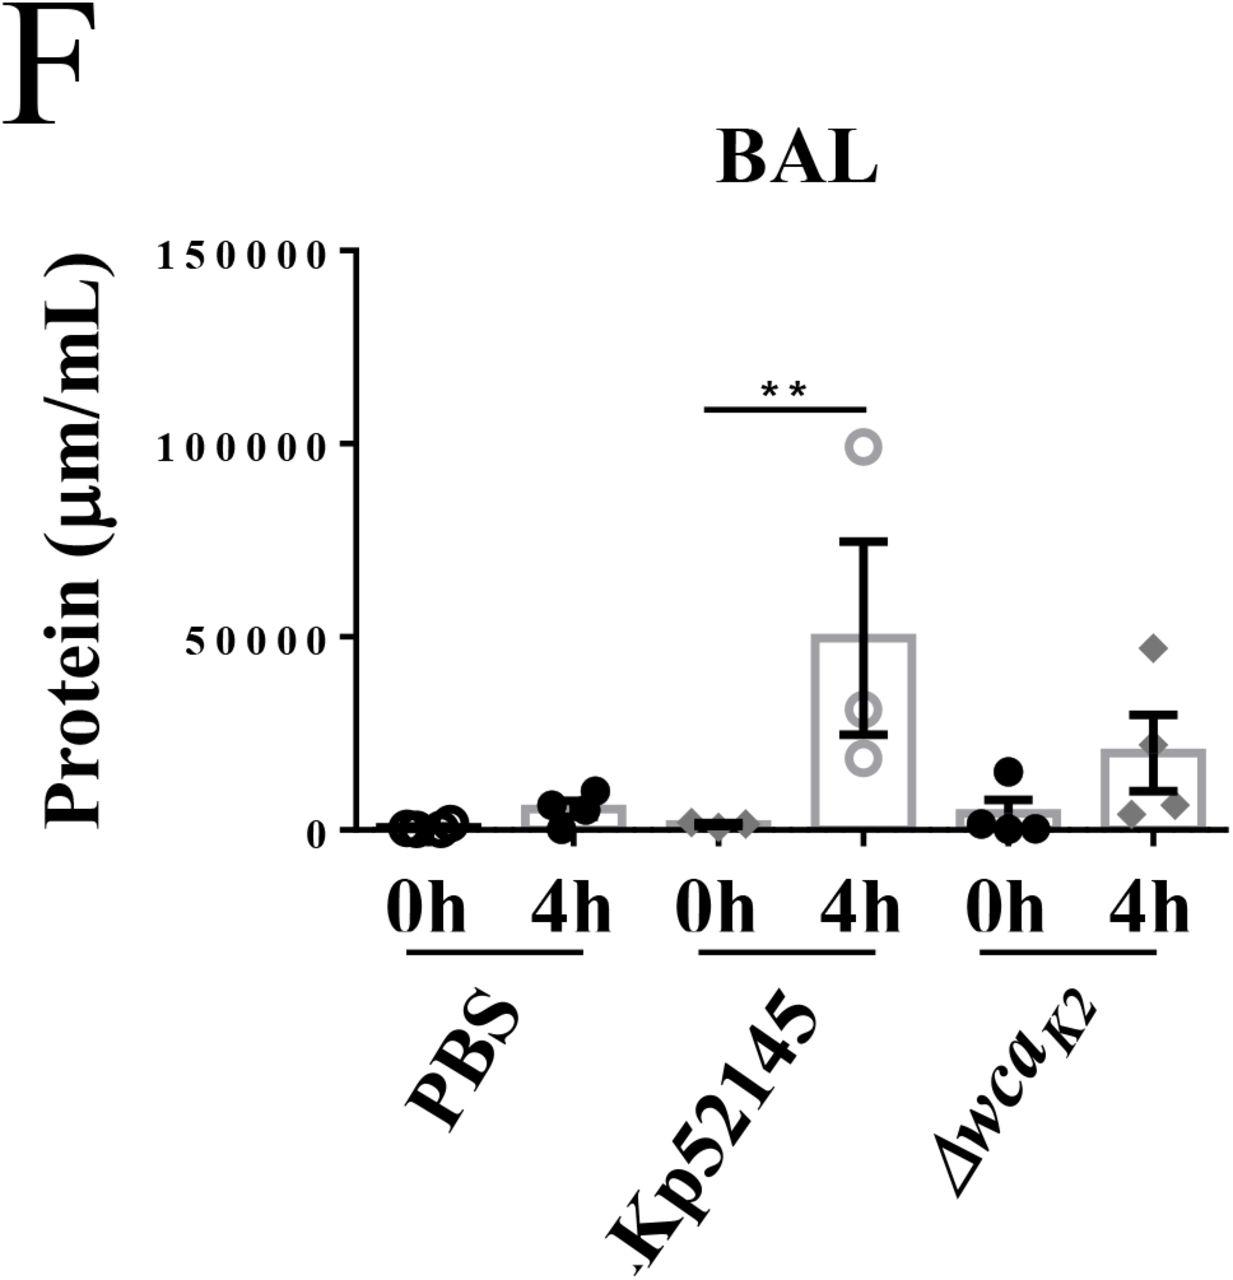 A porcine ex vivo lung perfusion model to investigate